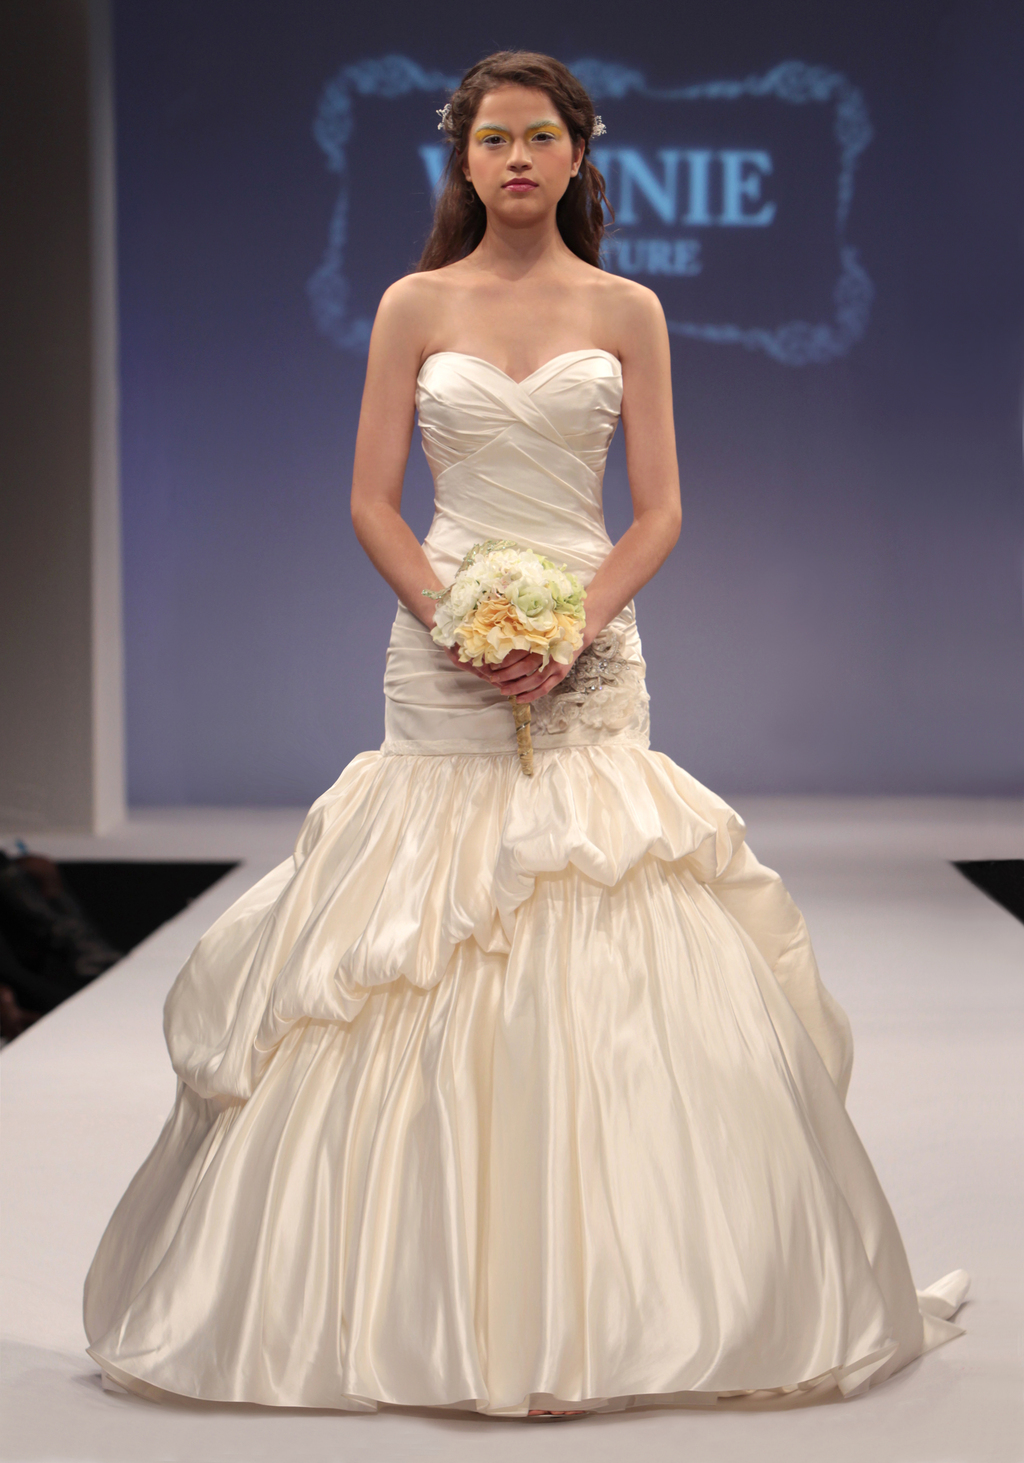 Winnie-couture-bridal-gown-spring-2013-wedding-dress-julienne.full